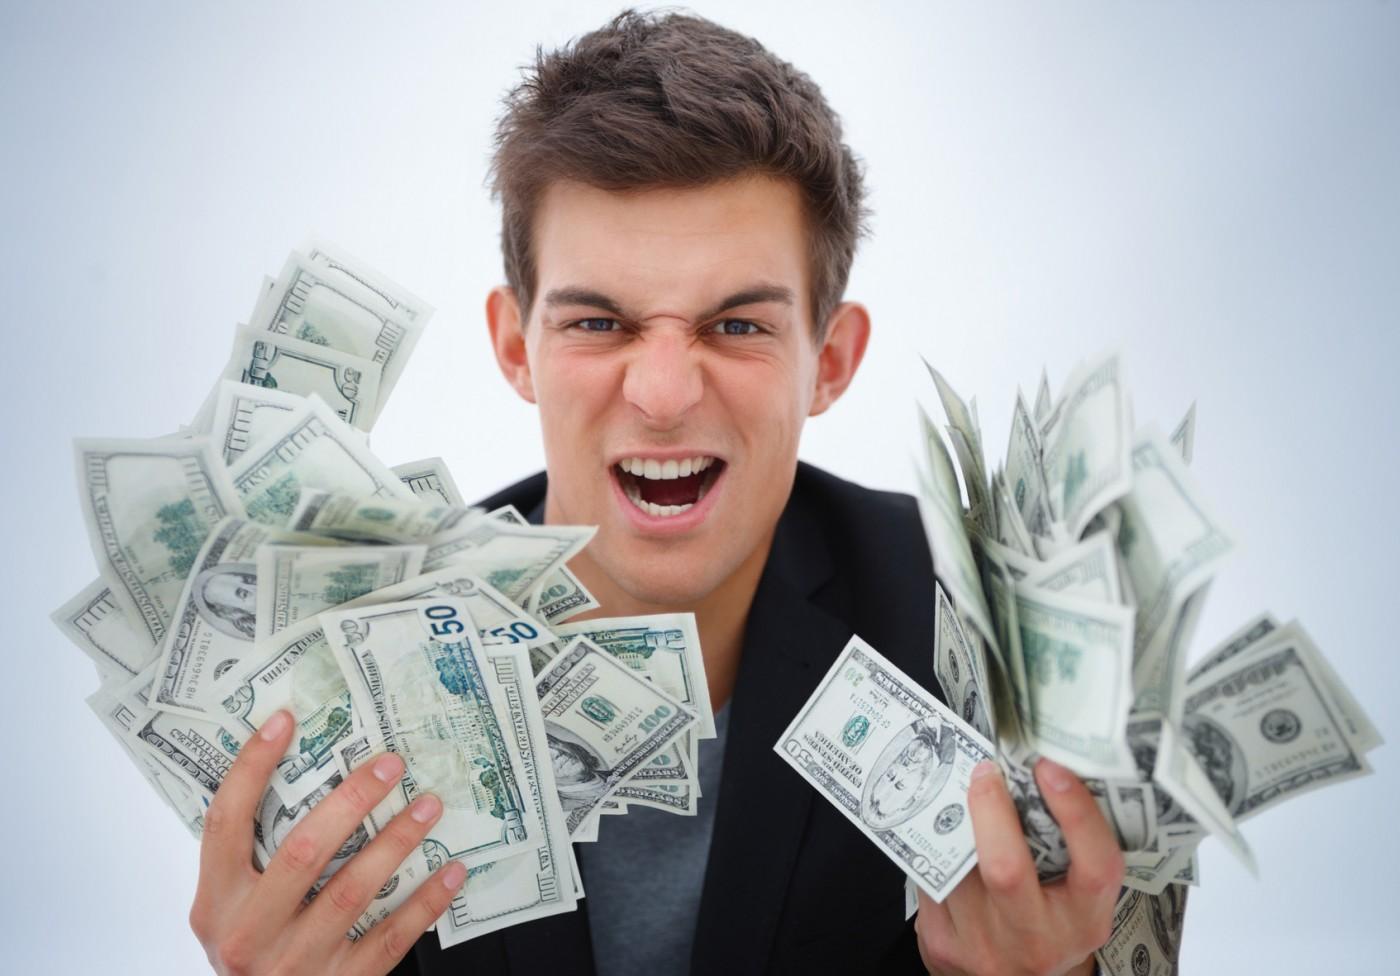 Closeup of a young business man holding money - Kasprzaka 29